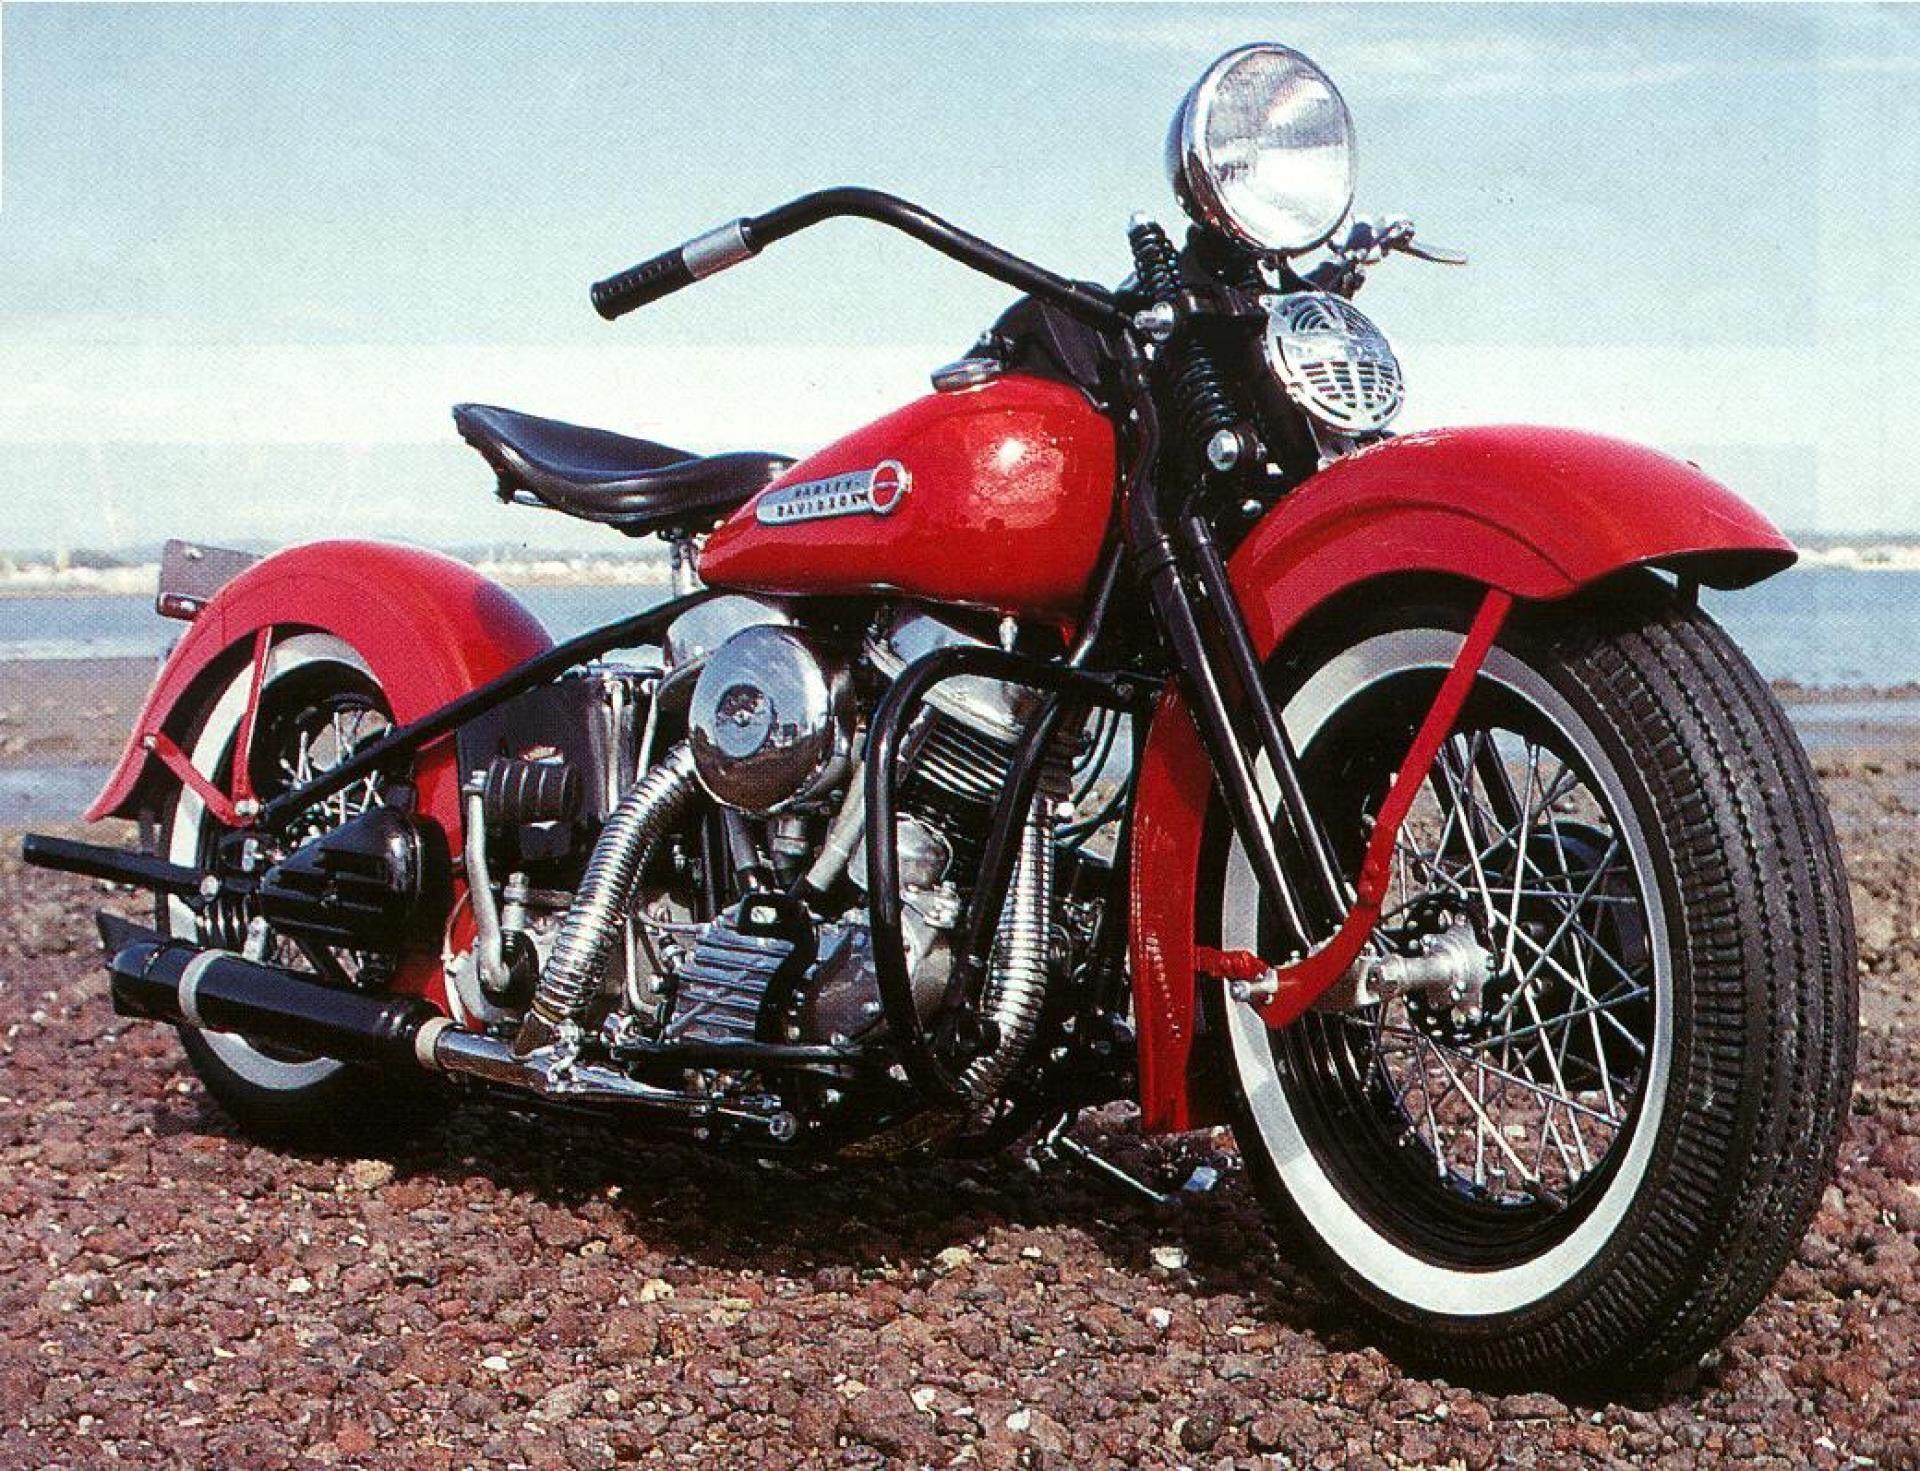 Harley Davidson 1950 | If I'll be rich man | Pinterest ...